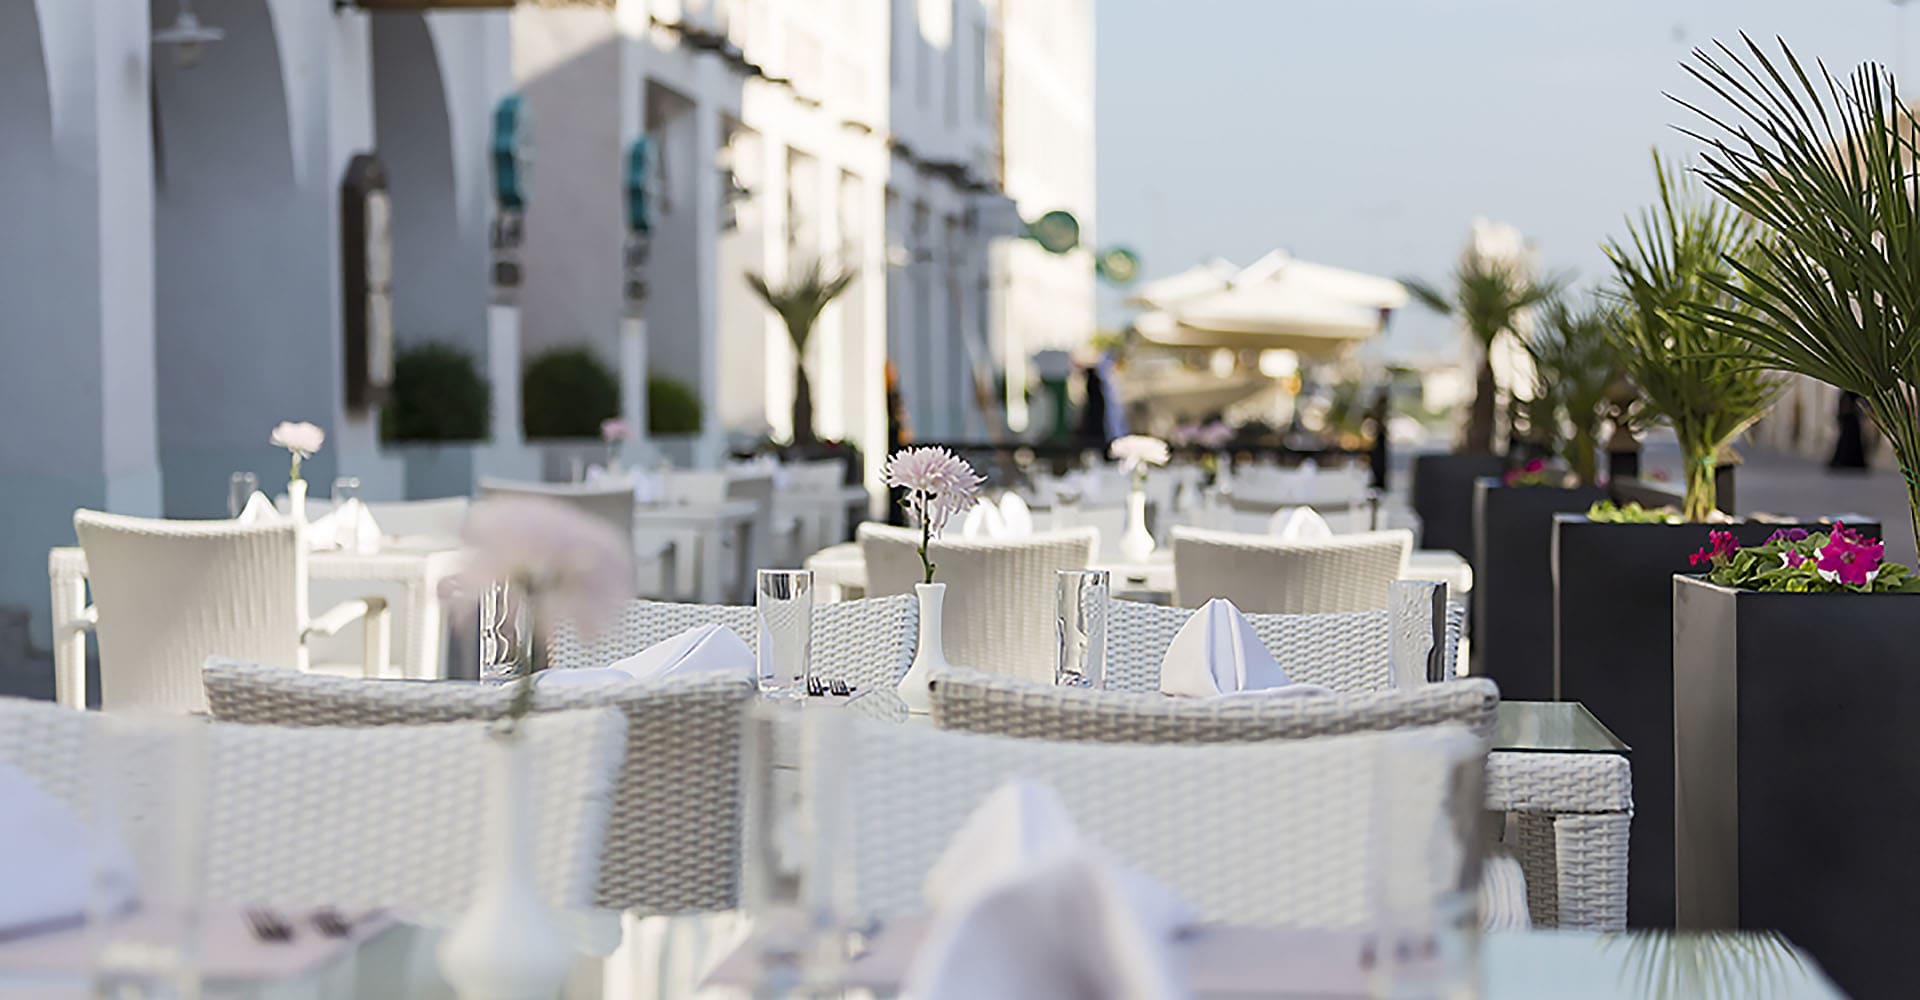 Restaurant Doha   Dining at La Patisserie